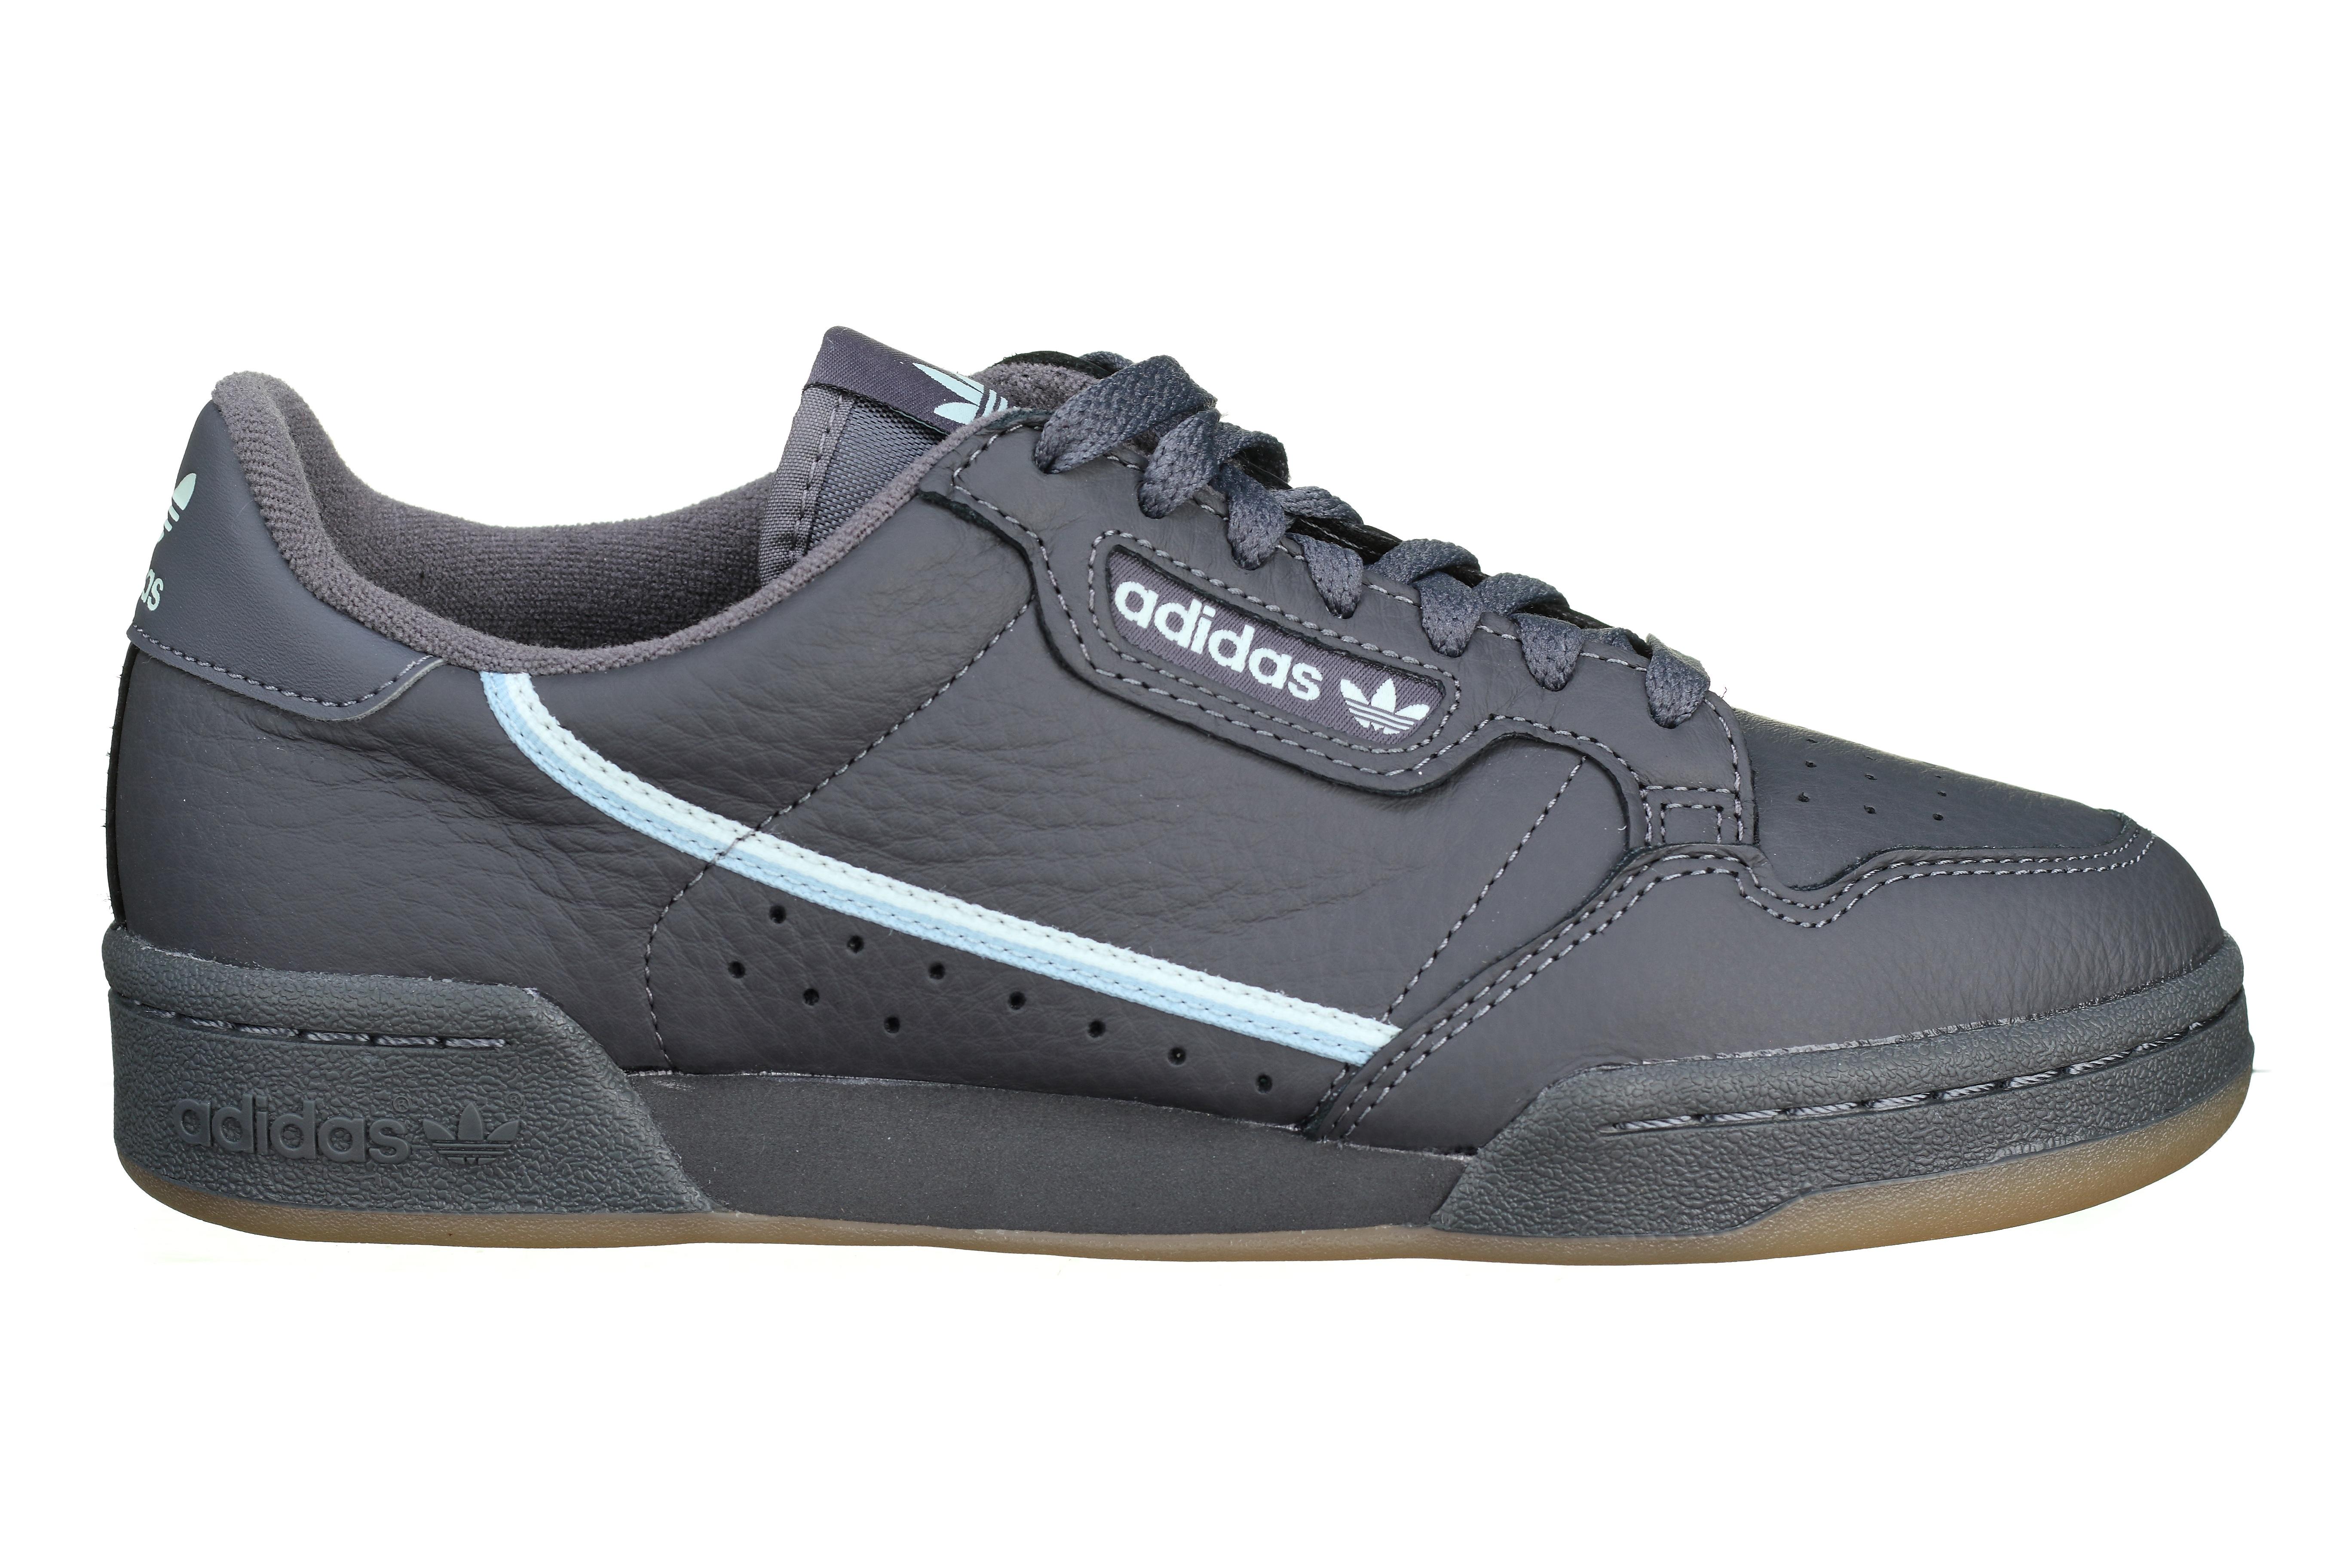 https://www.leadermode.com/169067/adidas-continental-80-g27705-black.jpg